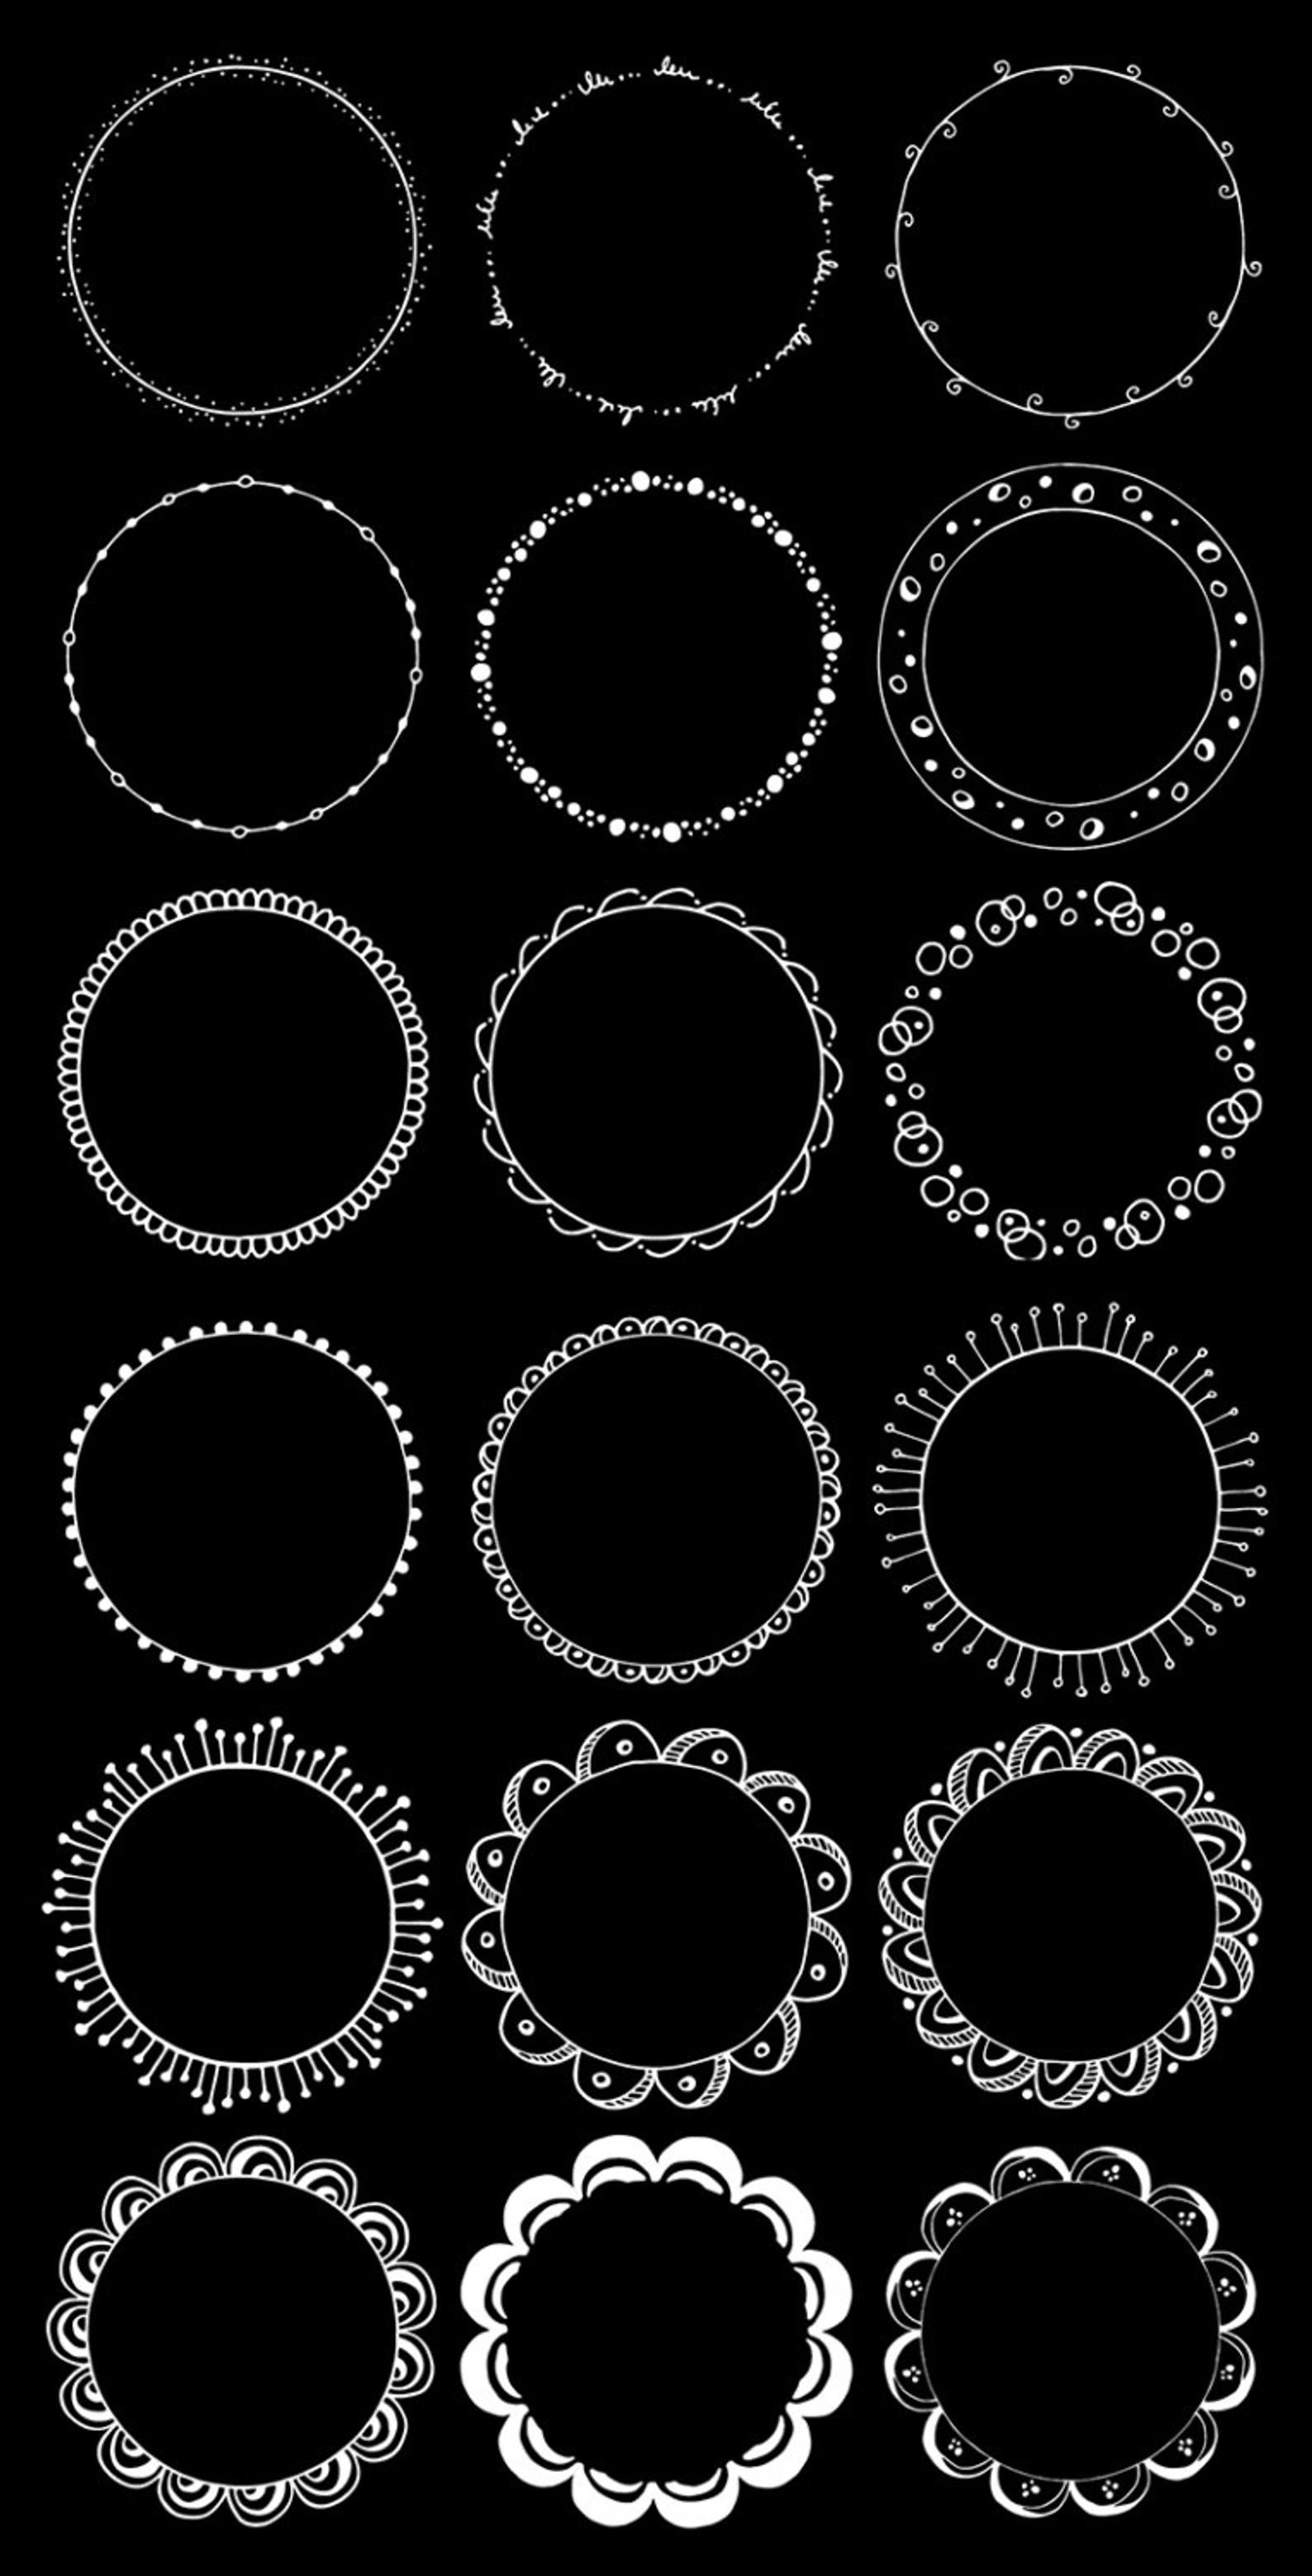 Drawn Circle Png : drawn, circle, Round, Frames, Clipart., Drawn, Circles, Floral, 手のスケッチ,, パターンデザイン,, デザイン